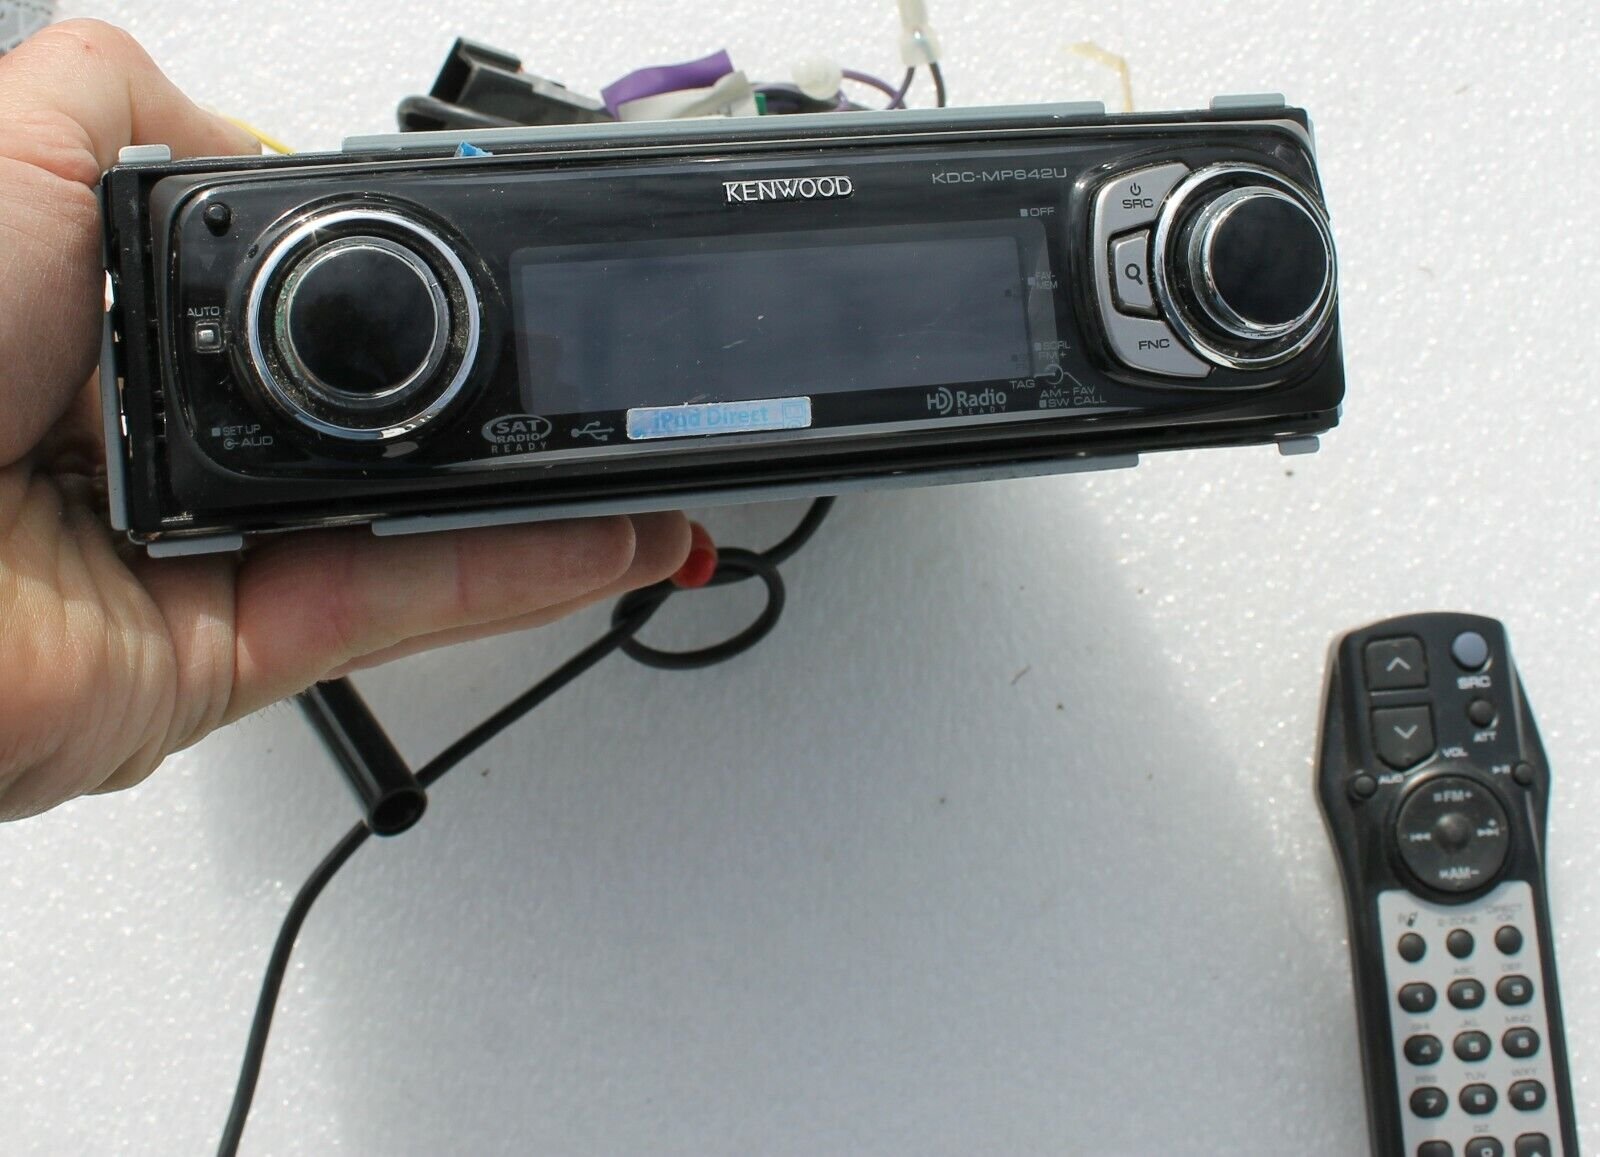 KENWOOD KDC-MP642U GENUINE Complete Radio with Wiring Harness & Remote for  sale online  eBay